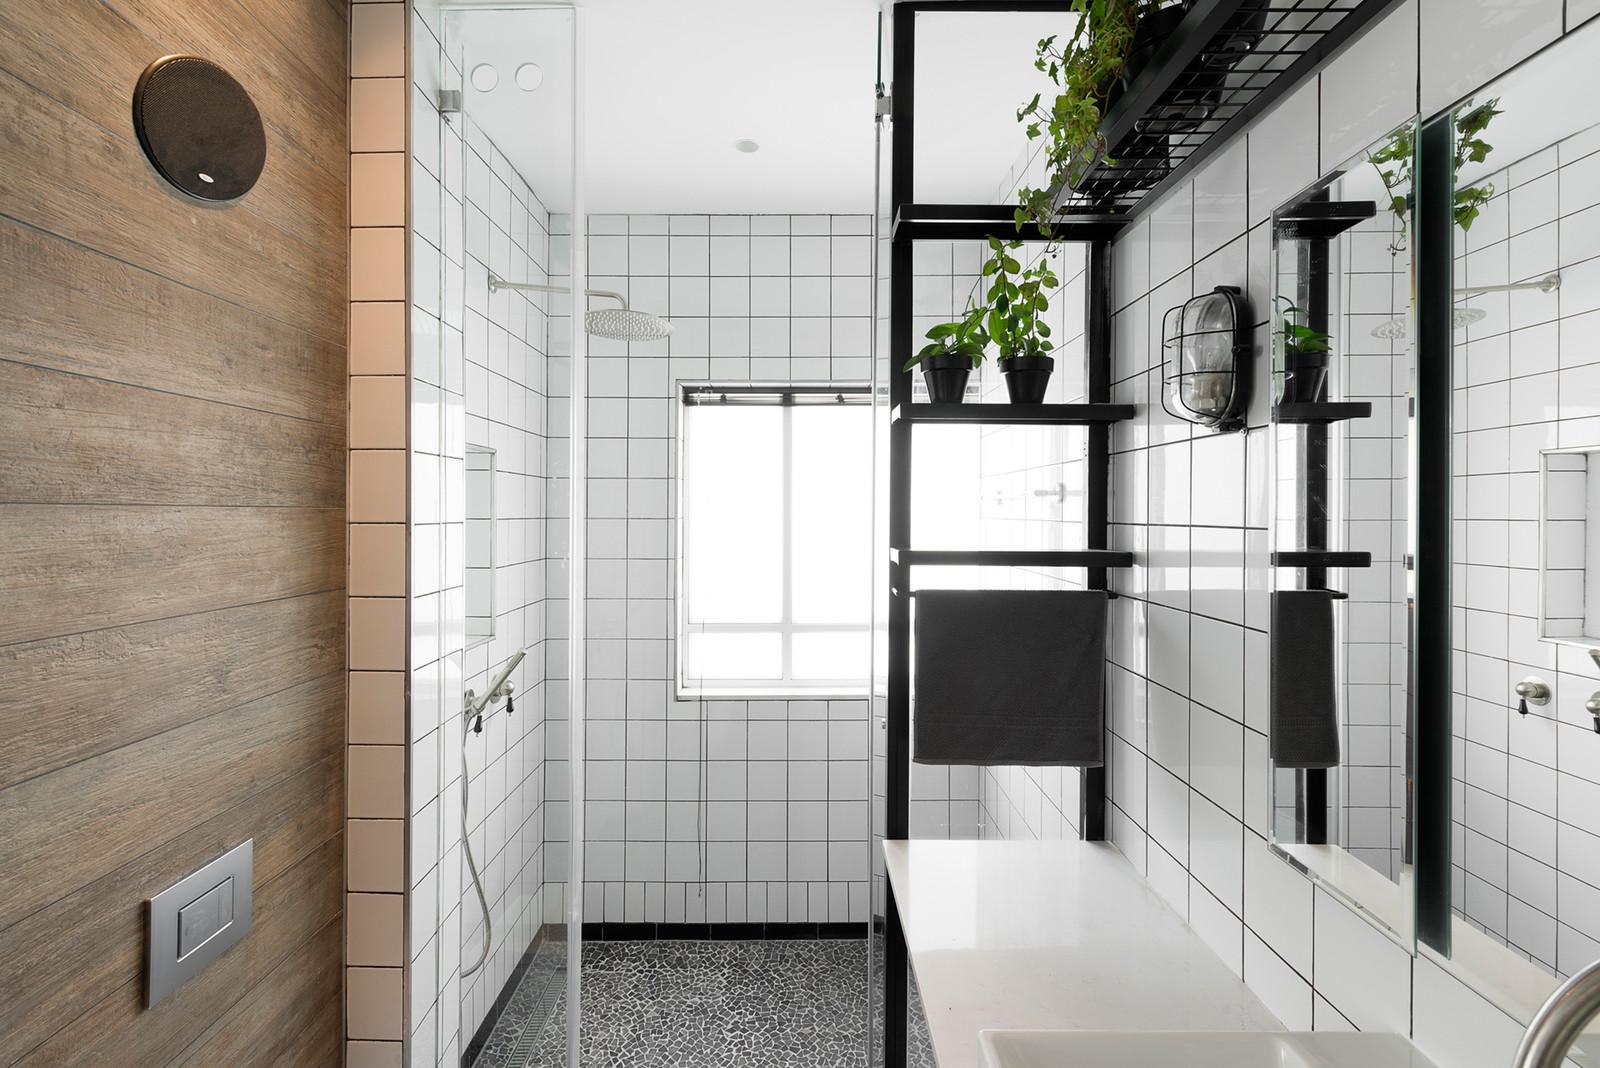 Apartment-renovation-just3ds.com-21